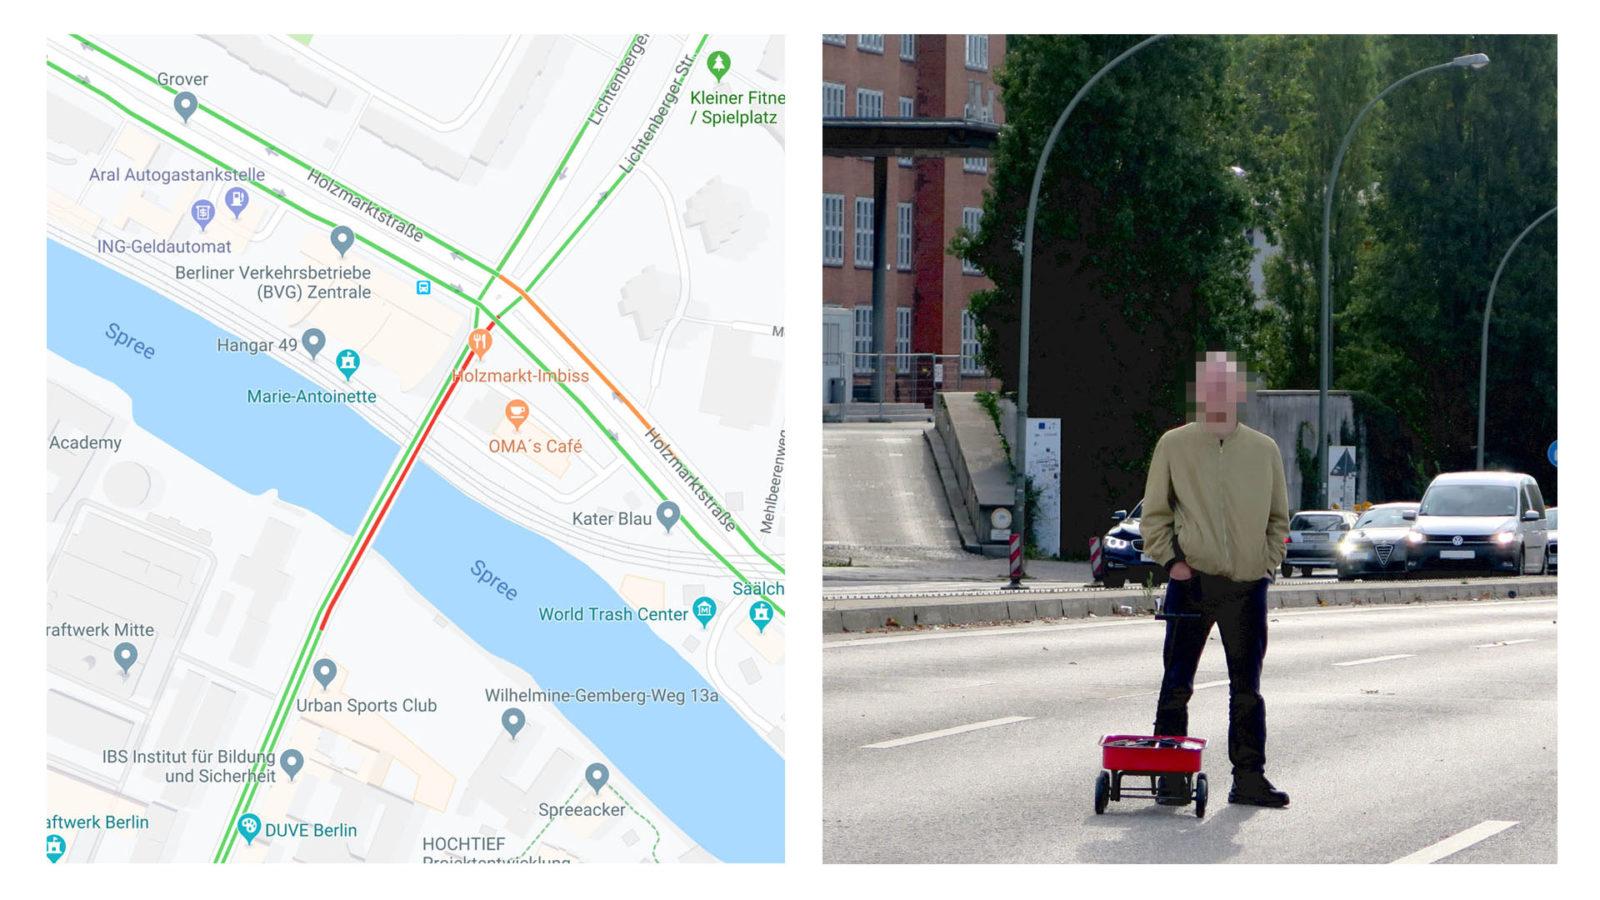 Google Maps Traffic Jam